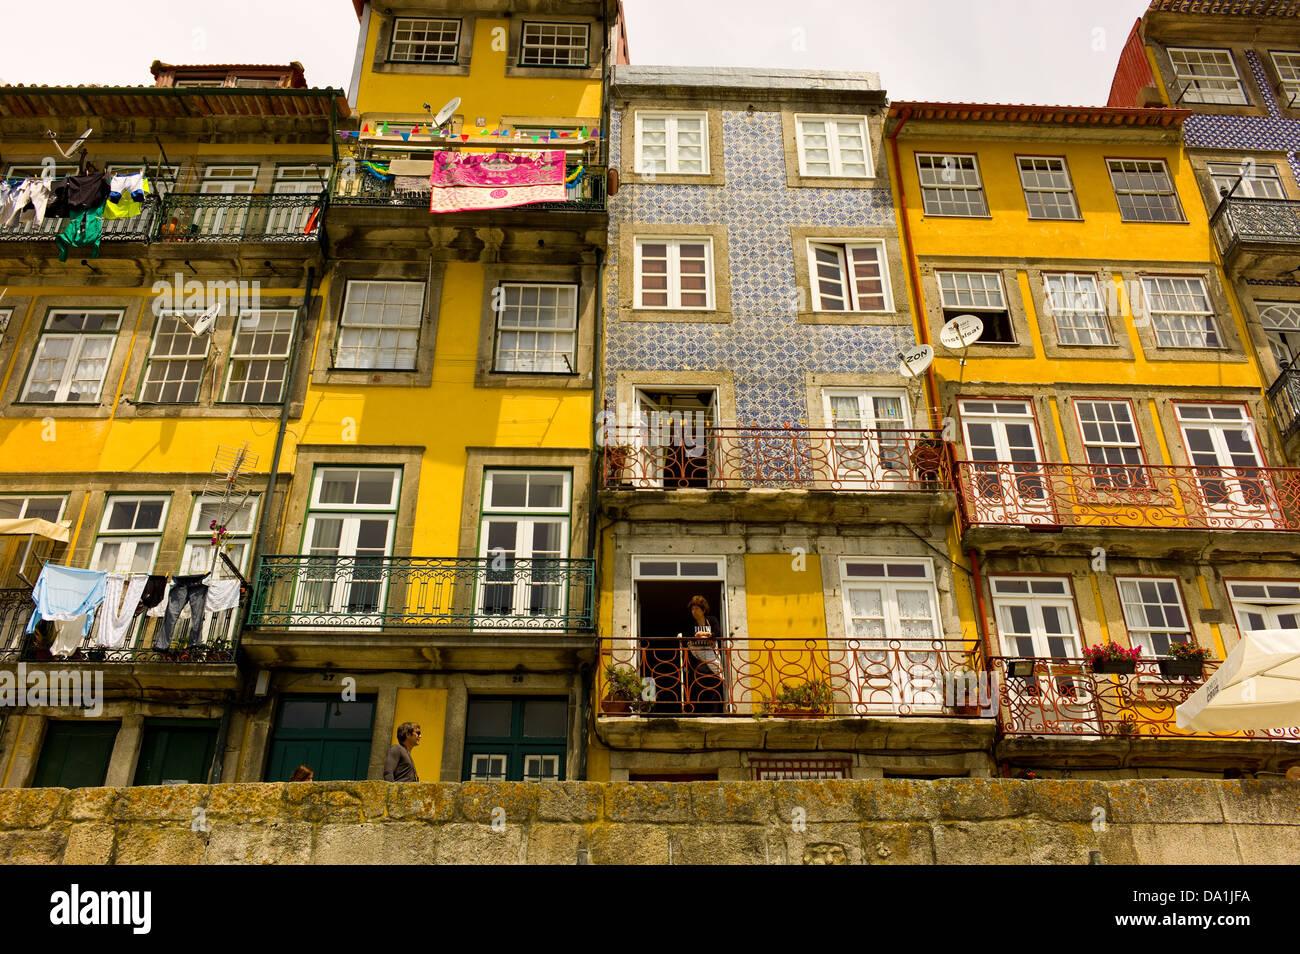 Porto  Oporto Waterfront, Portugal on the River Douro - Stock Image